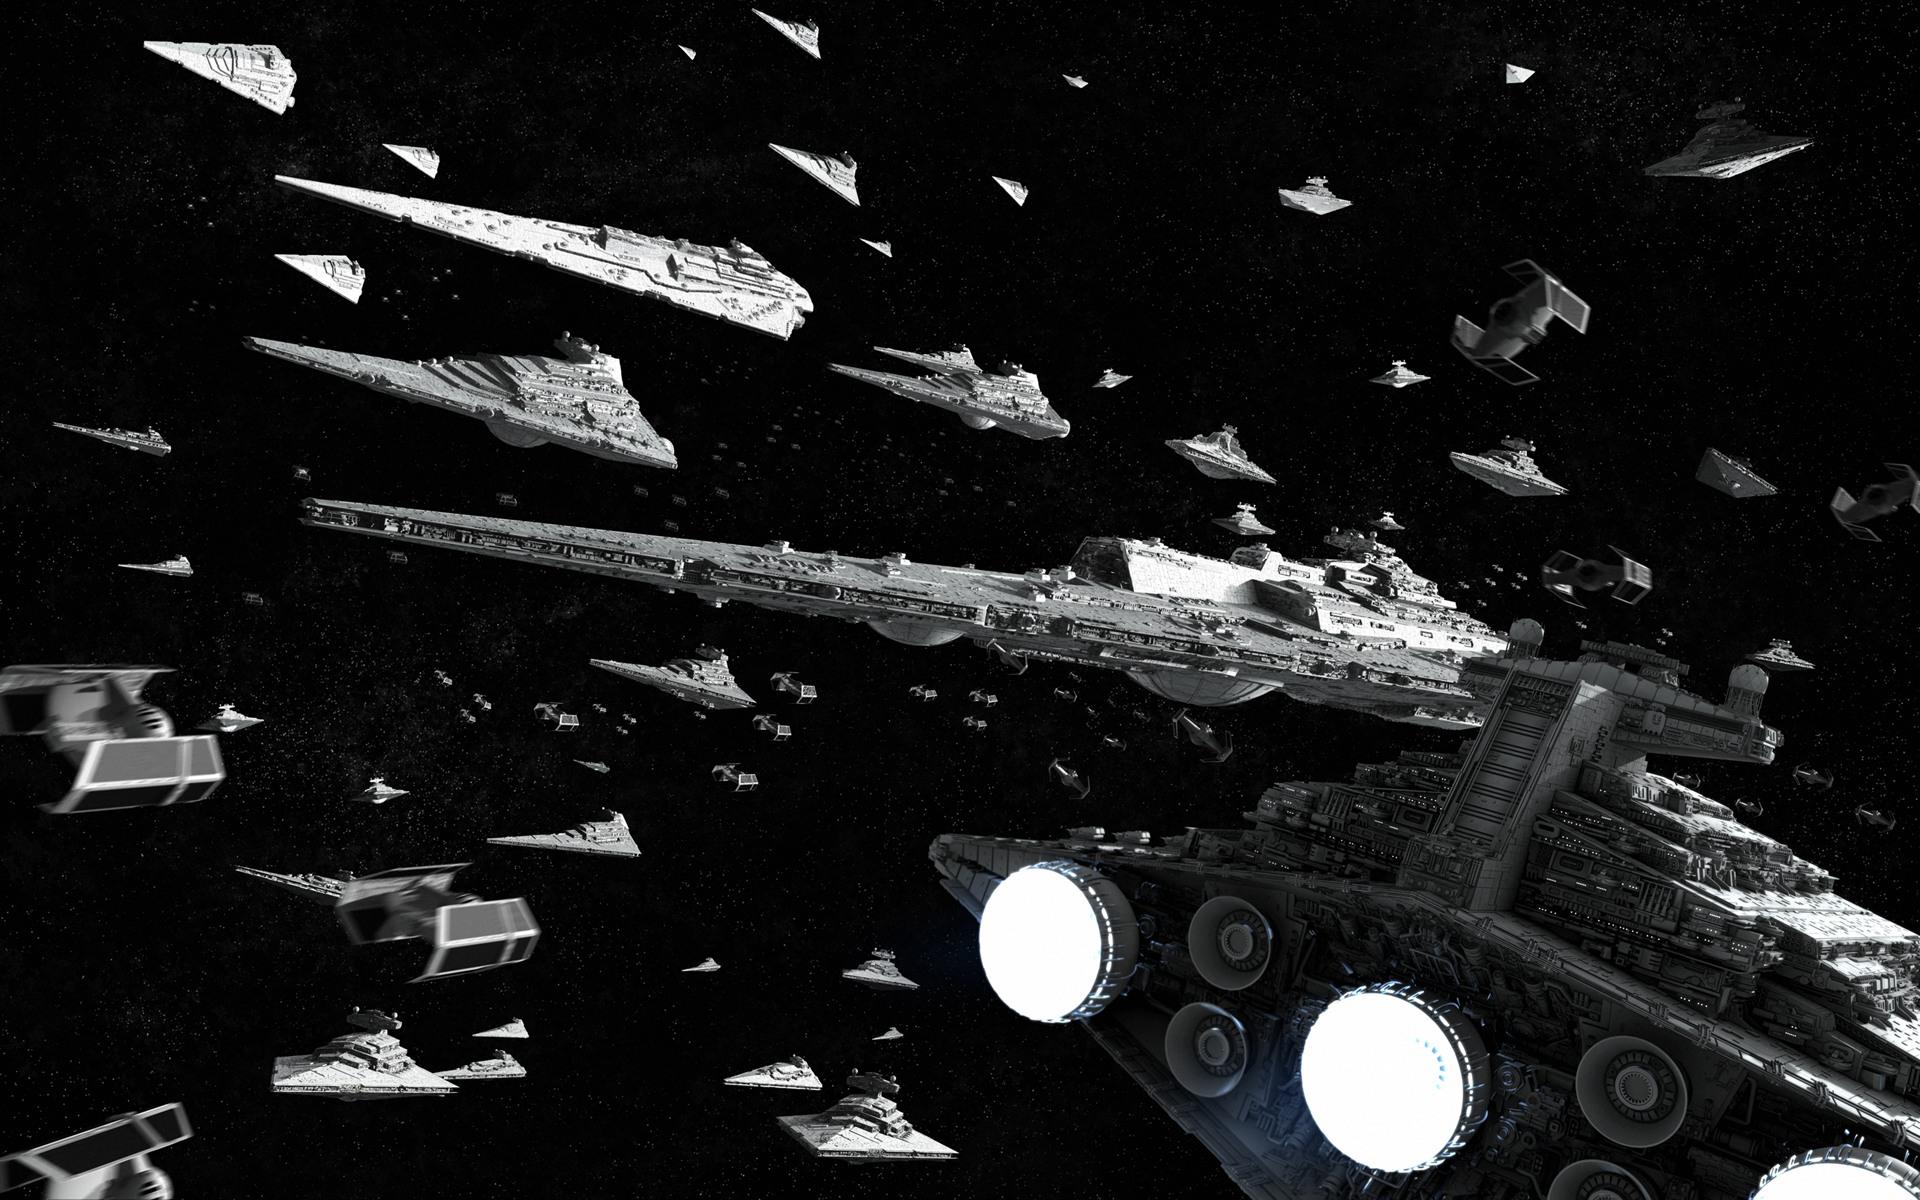 Star Wars Background Wallpaper - WallpaperSafari